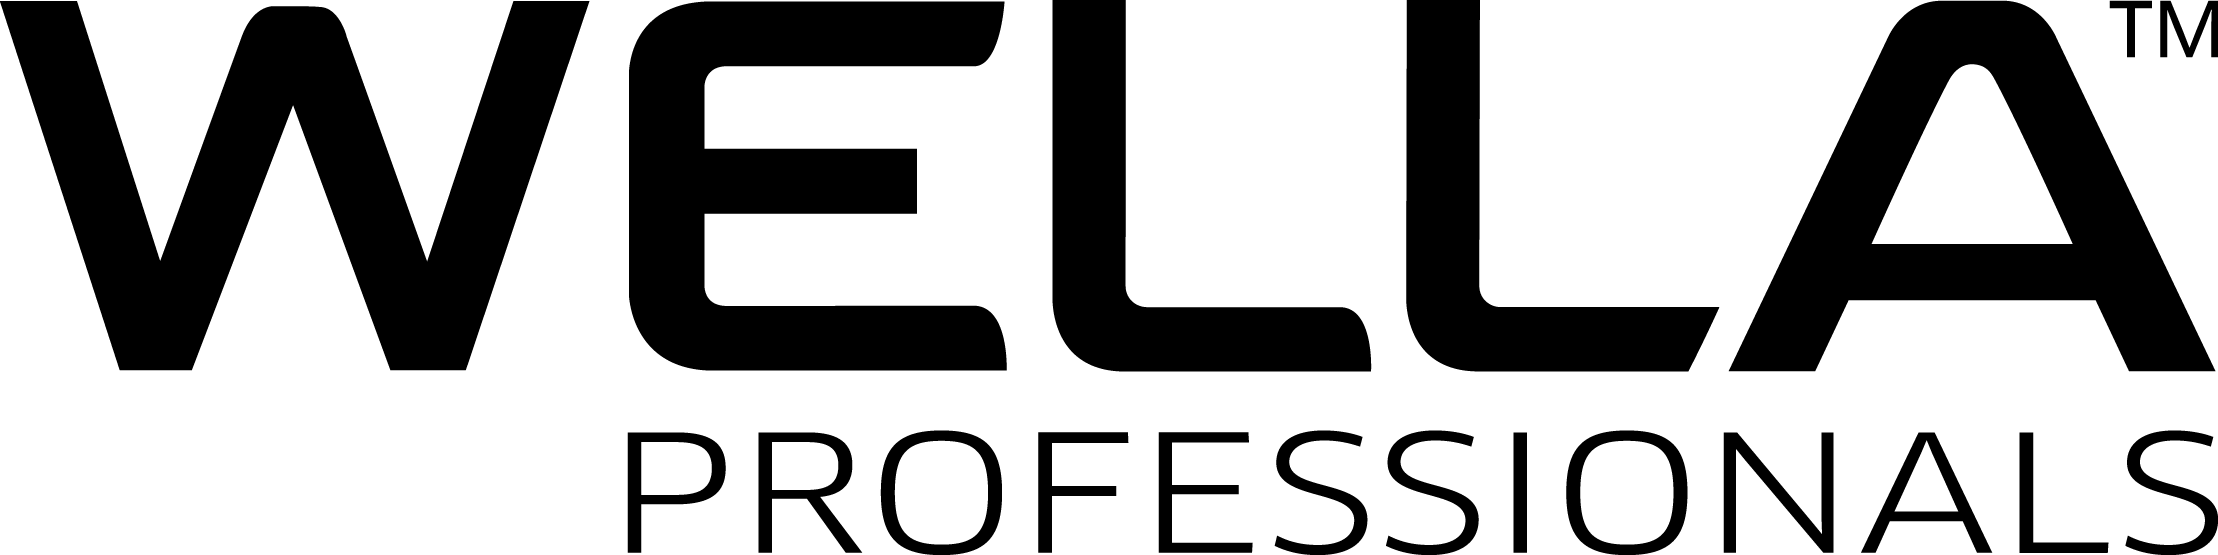 Wella_black_logo